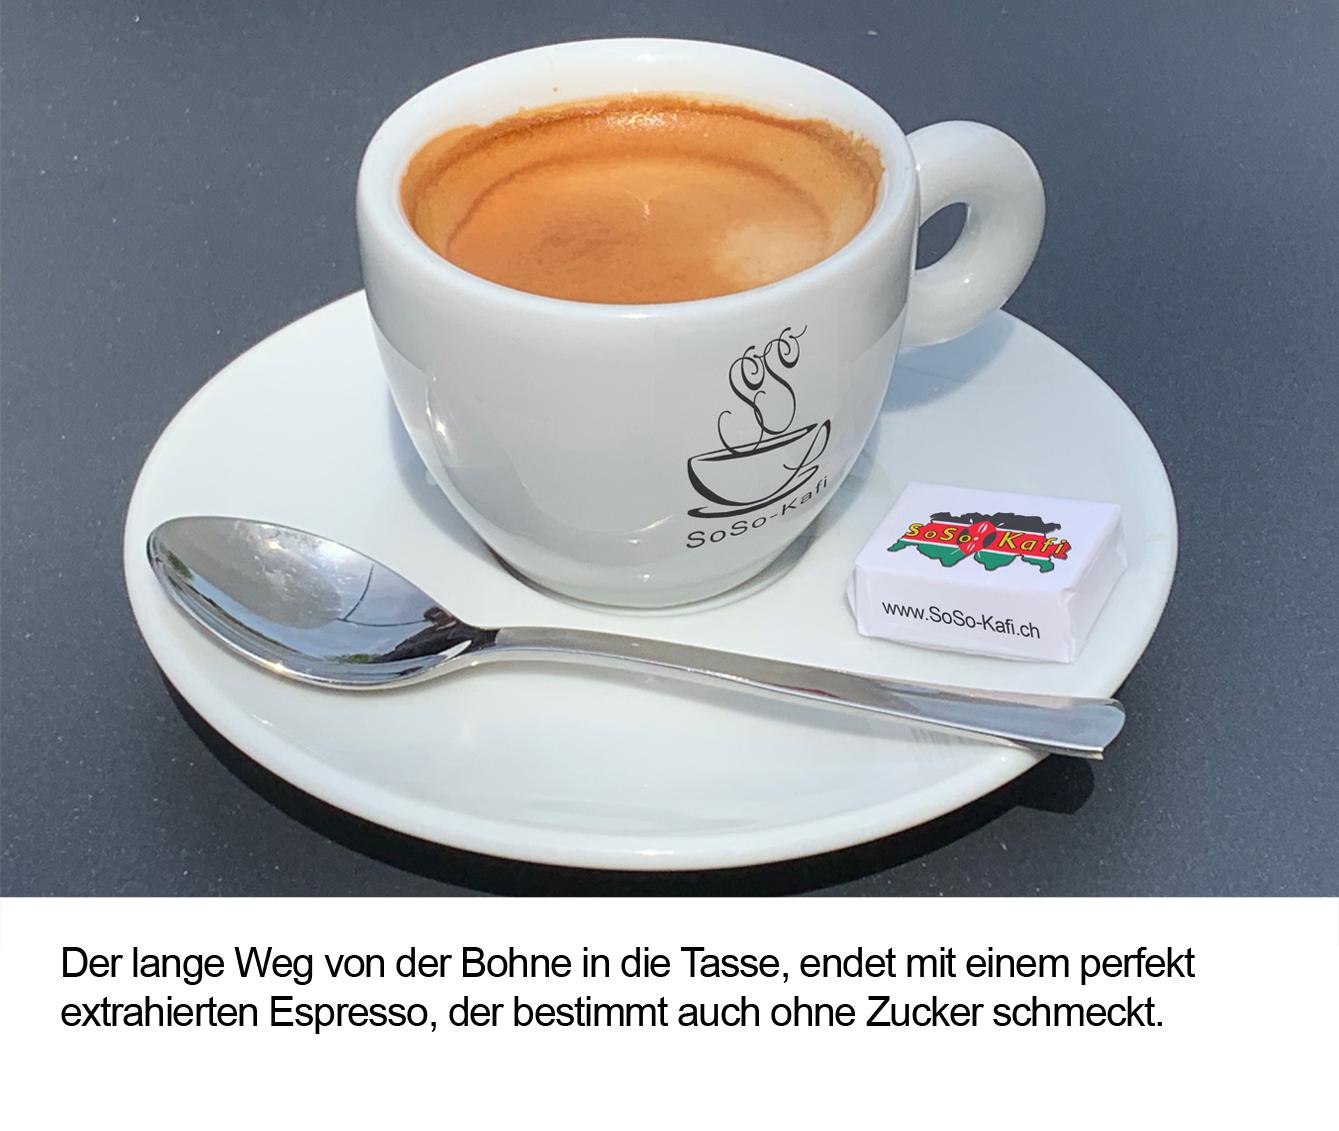 Diskrete Treffen Neubrunn, seitensprung in Munsingen